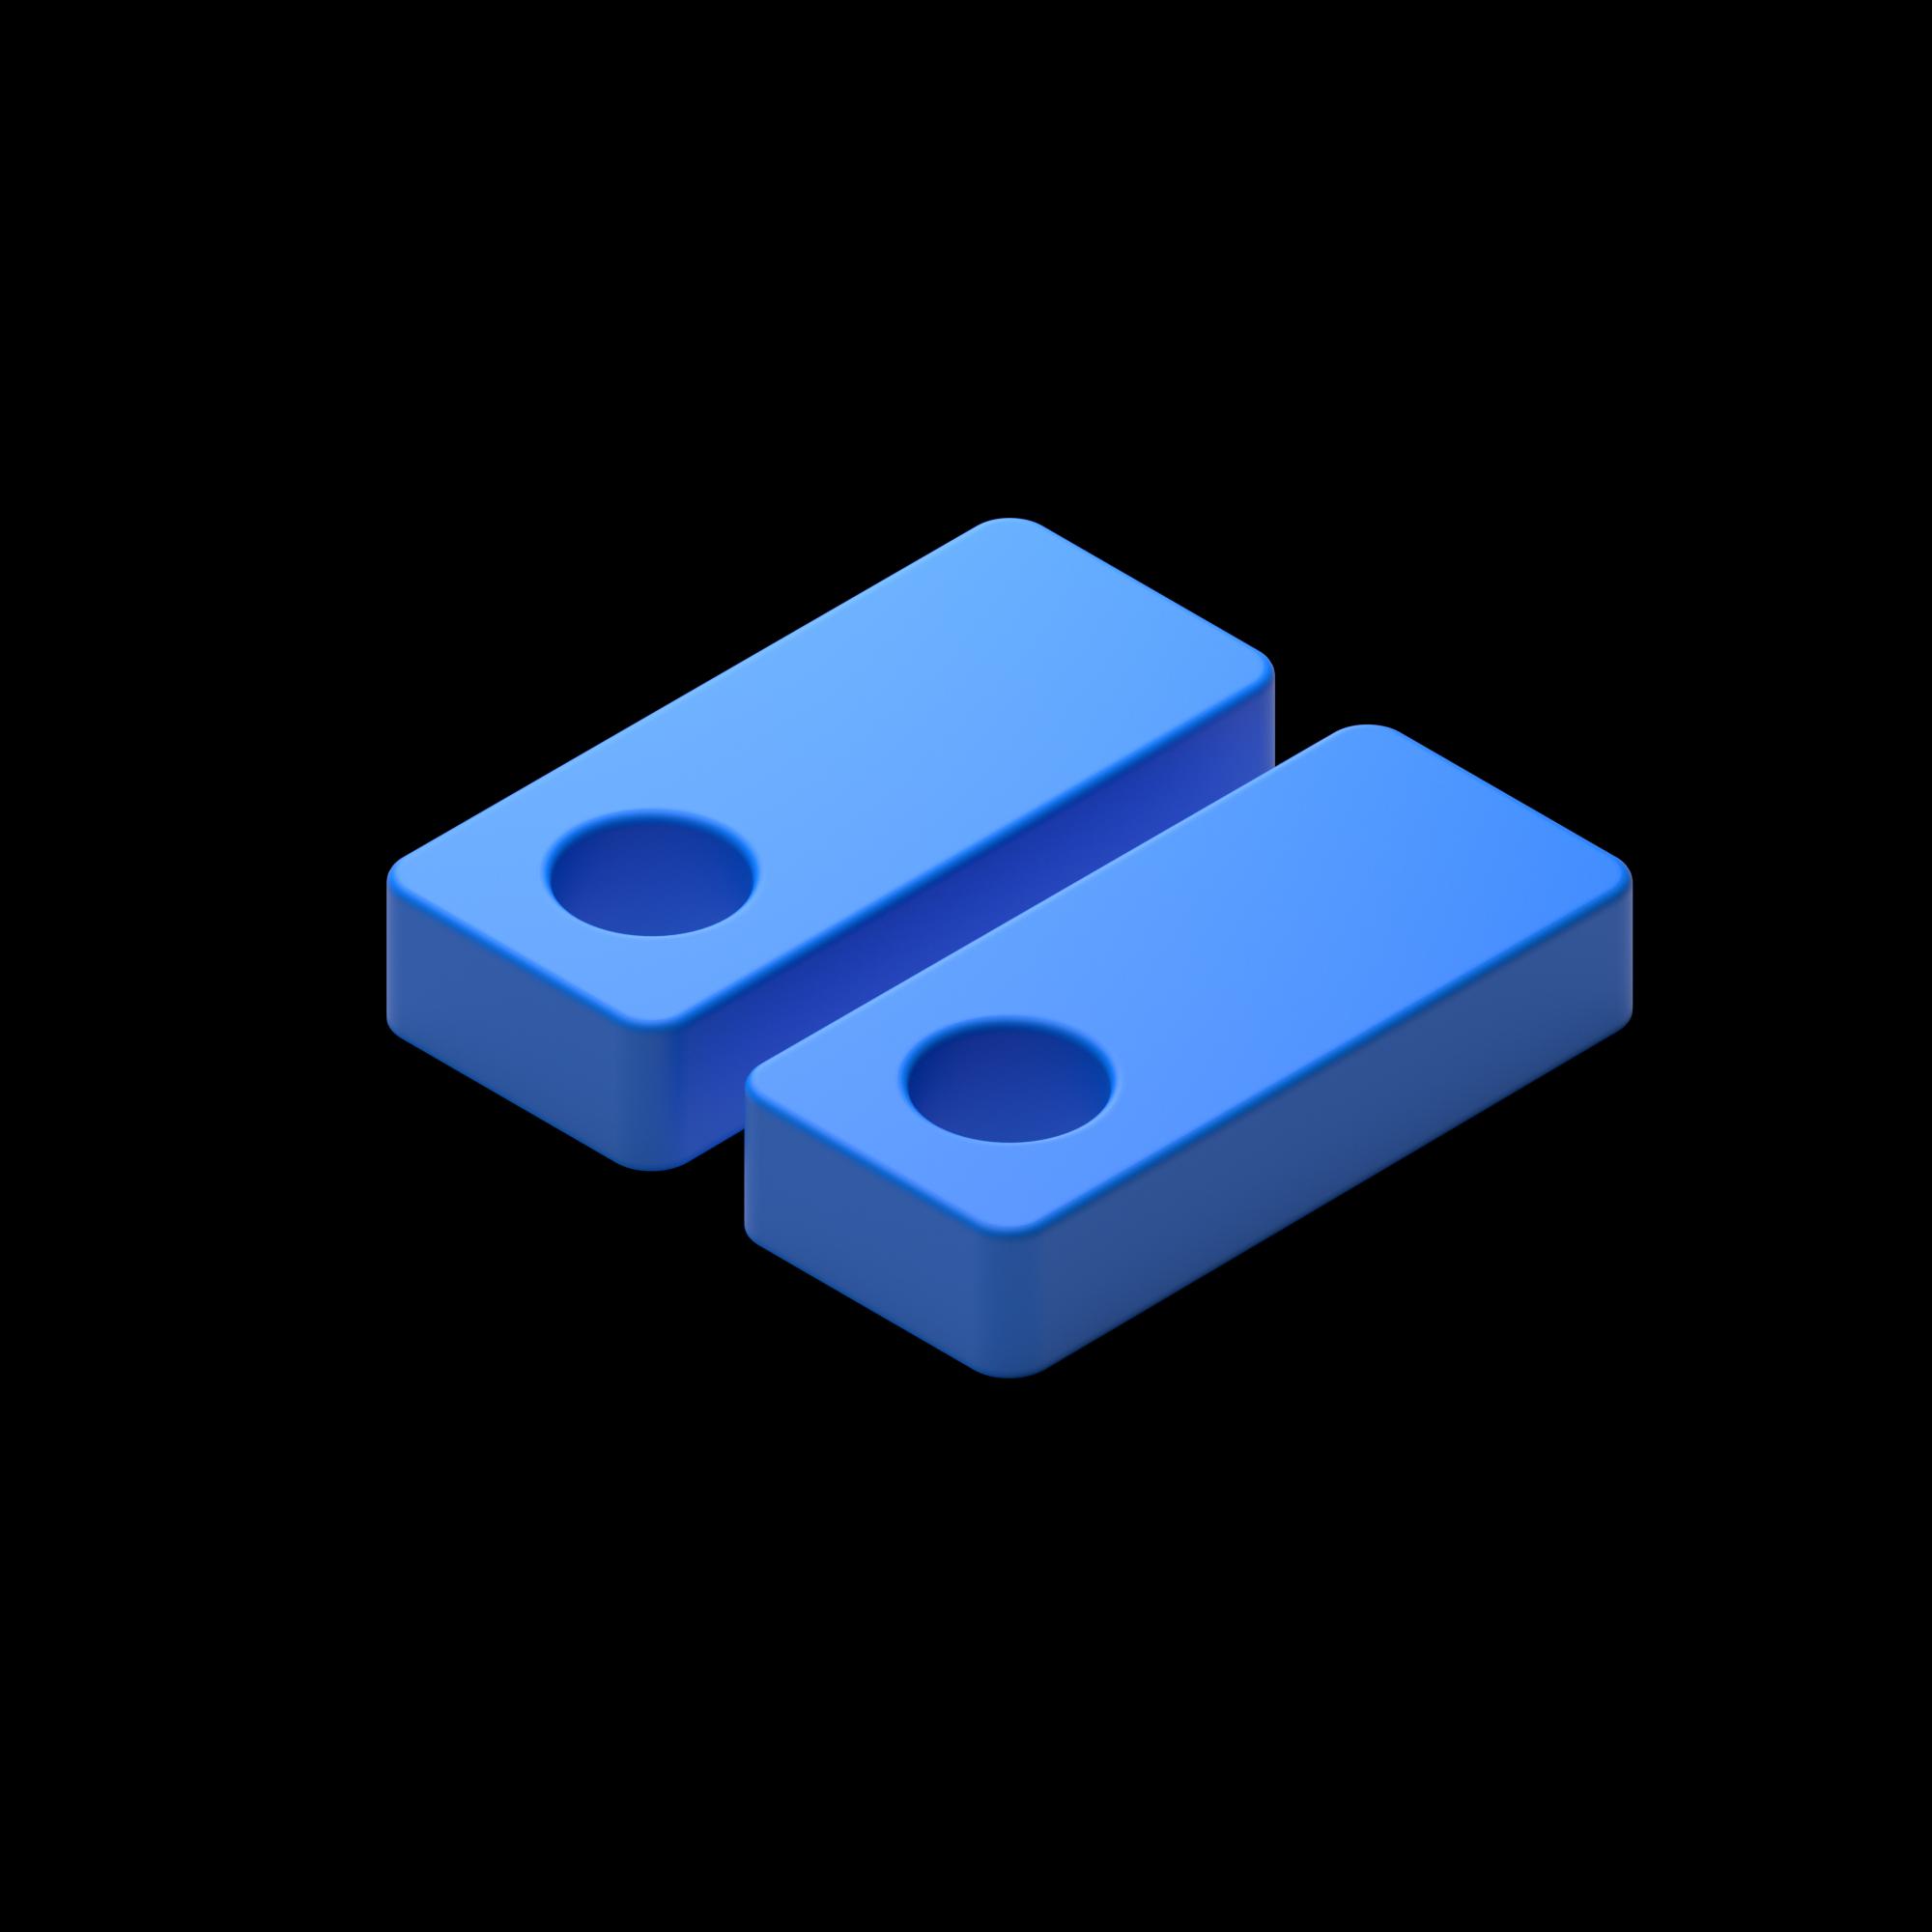 3D tasks icon